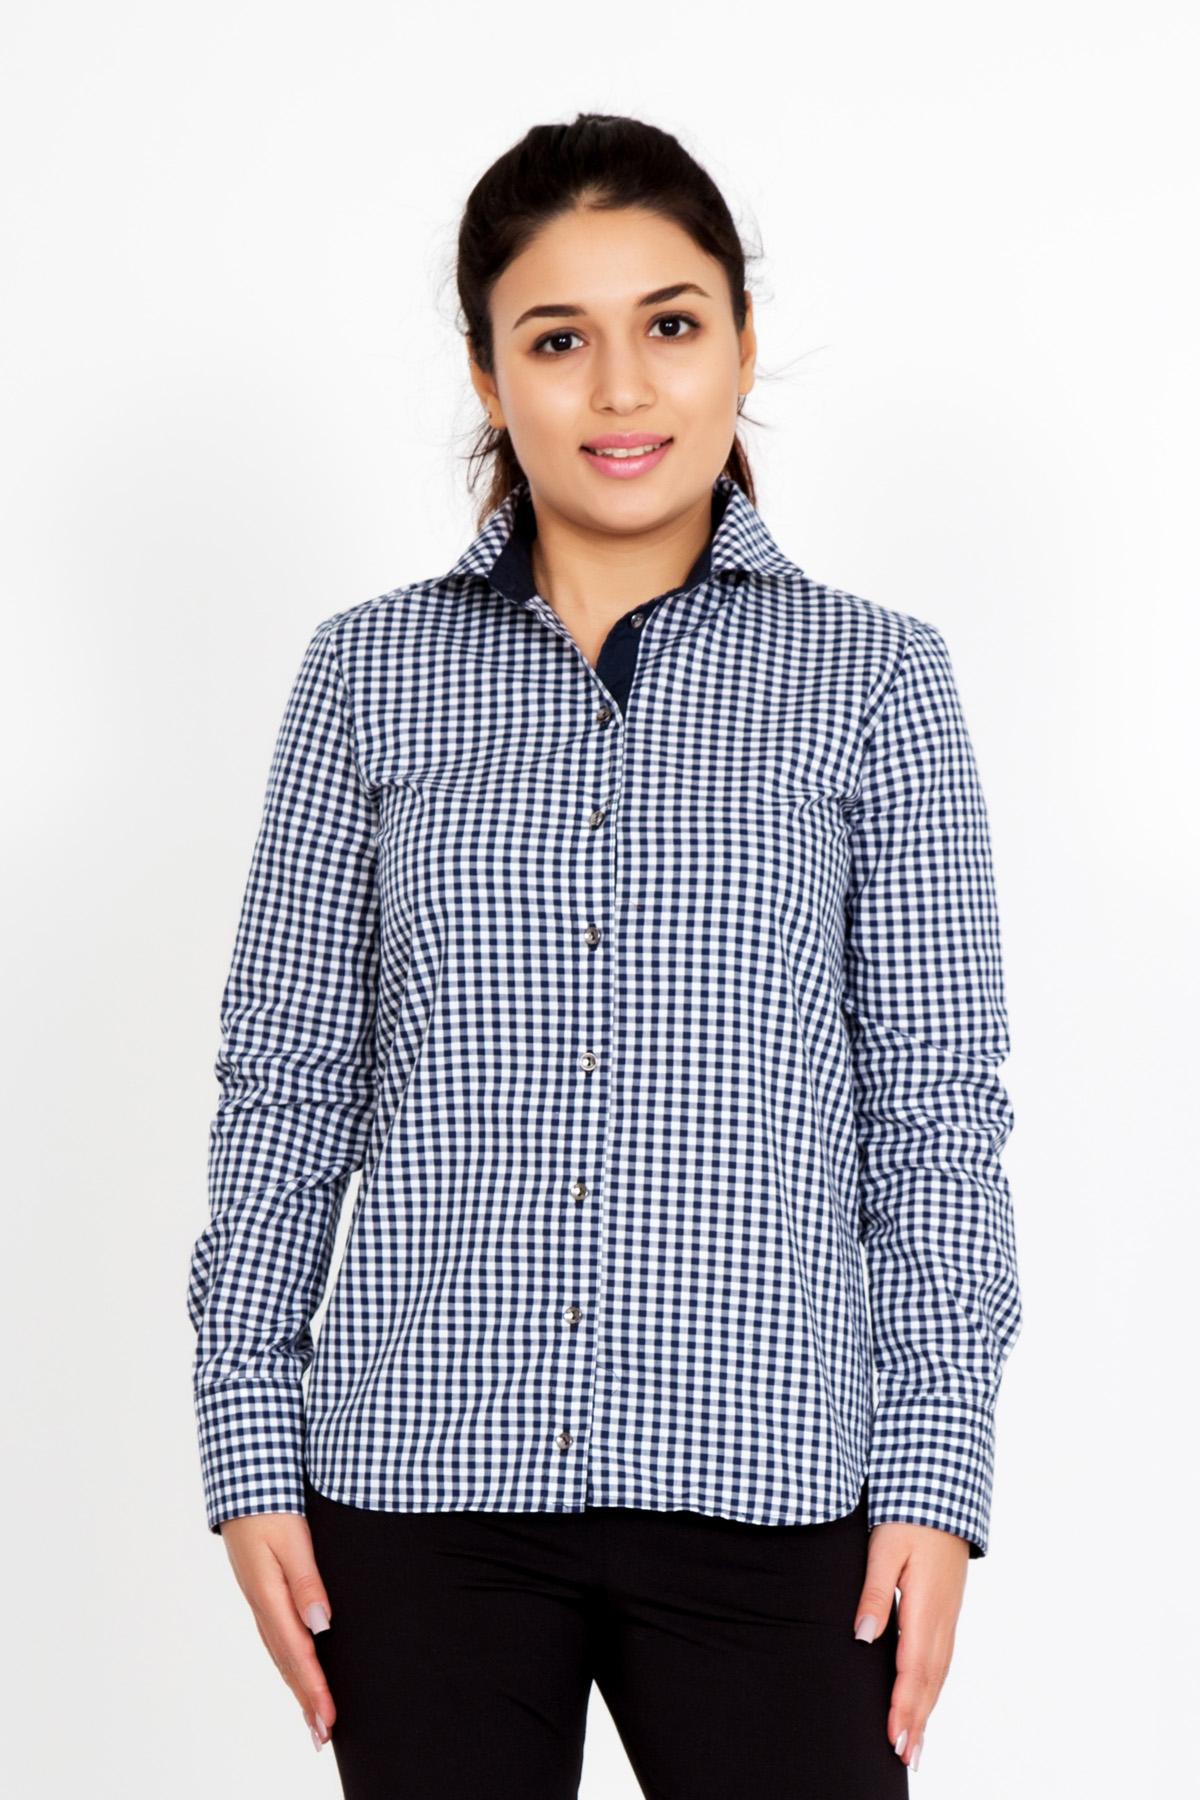 Жен. рубашка  Нидия  Темно-синий р. 50 - Женская одежда артикул: 23508